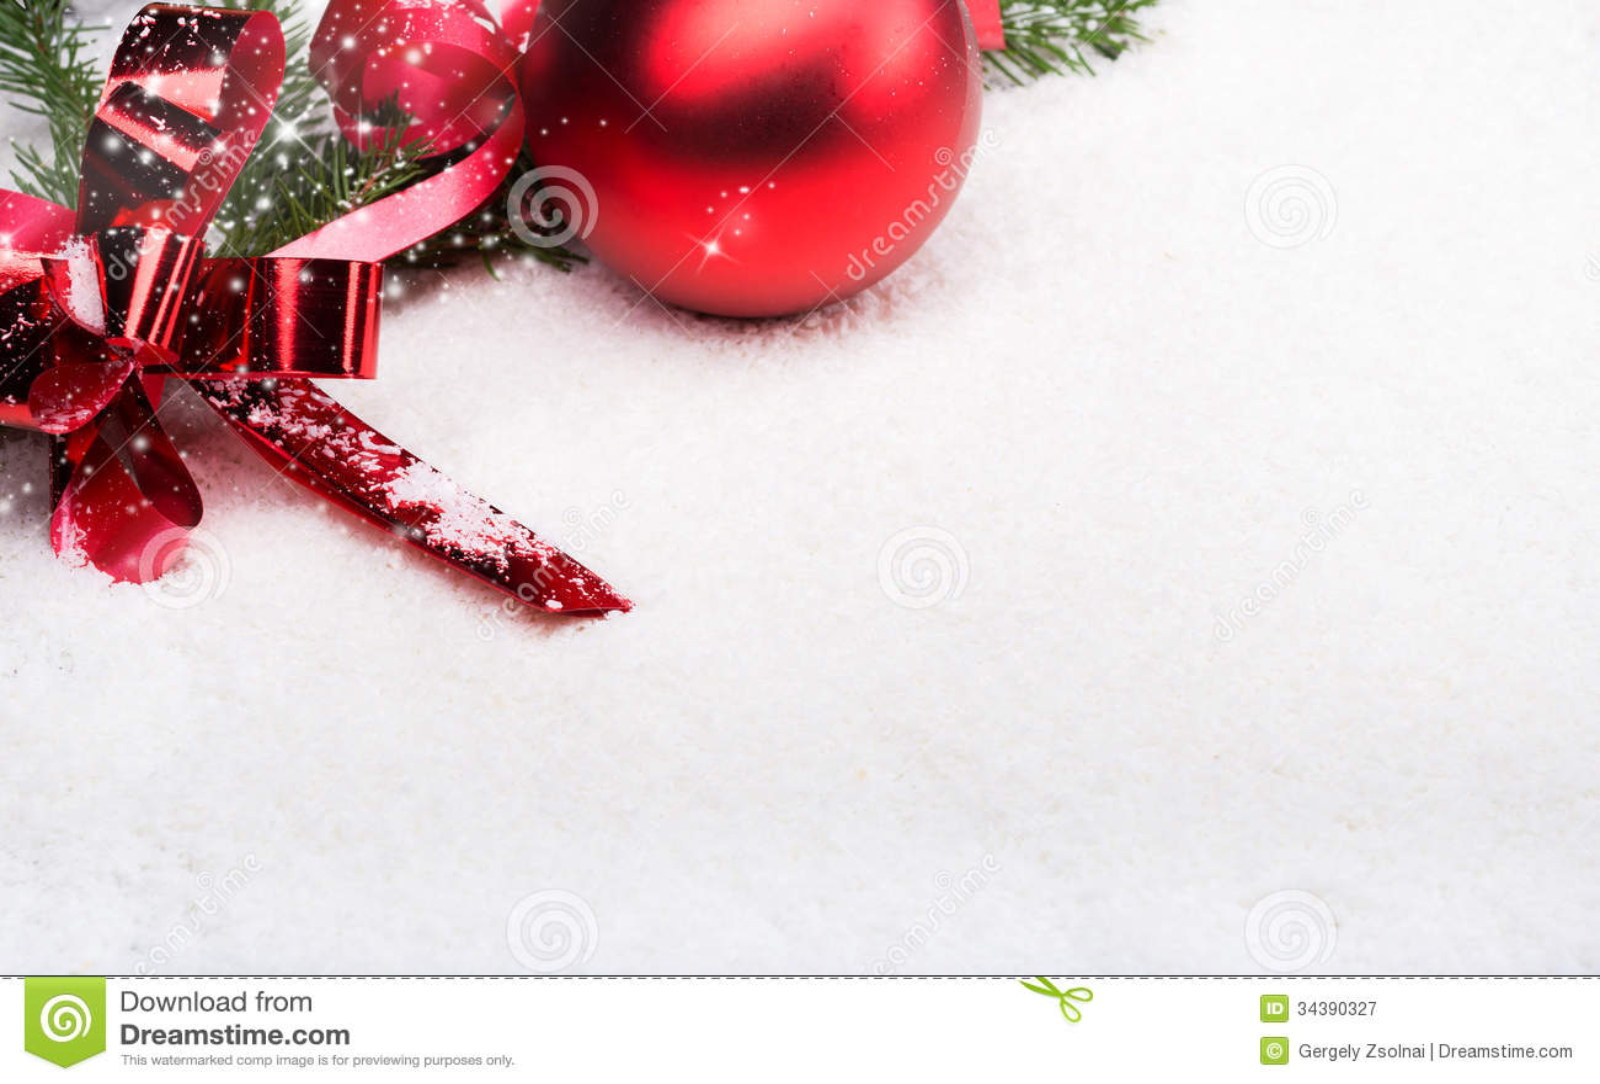 Merry Christmas stock image. Image of snow, season, happy - 34390327